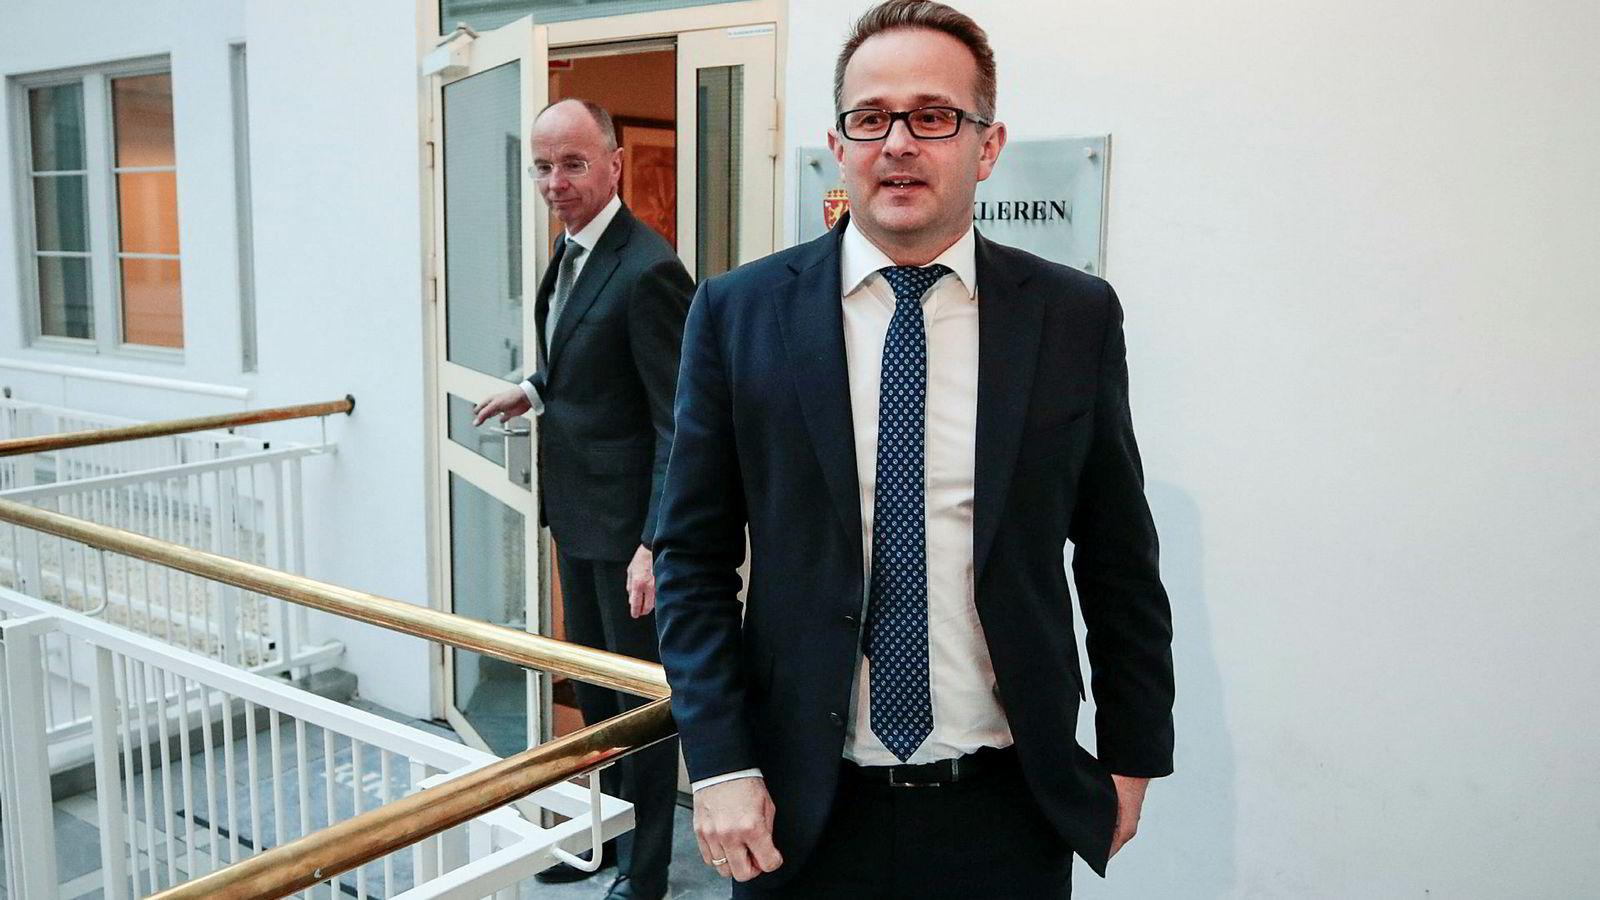 Riksmekler Mats Wilhelm Ruland og Nils-Henrik Mørch von der Fehr møter pressen i forbindelse med sykehusoppgjøret tirsdag kveld på riksmeklerens kontor i Oslo.